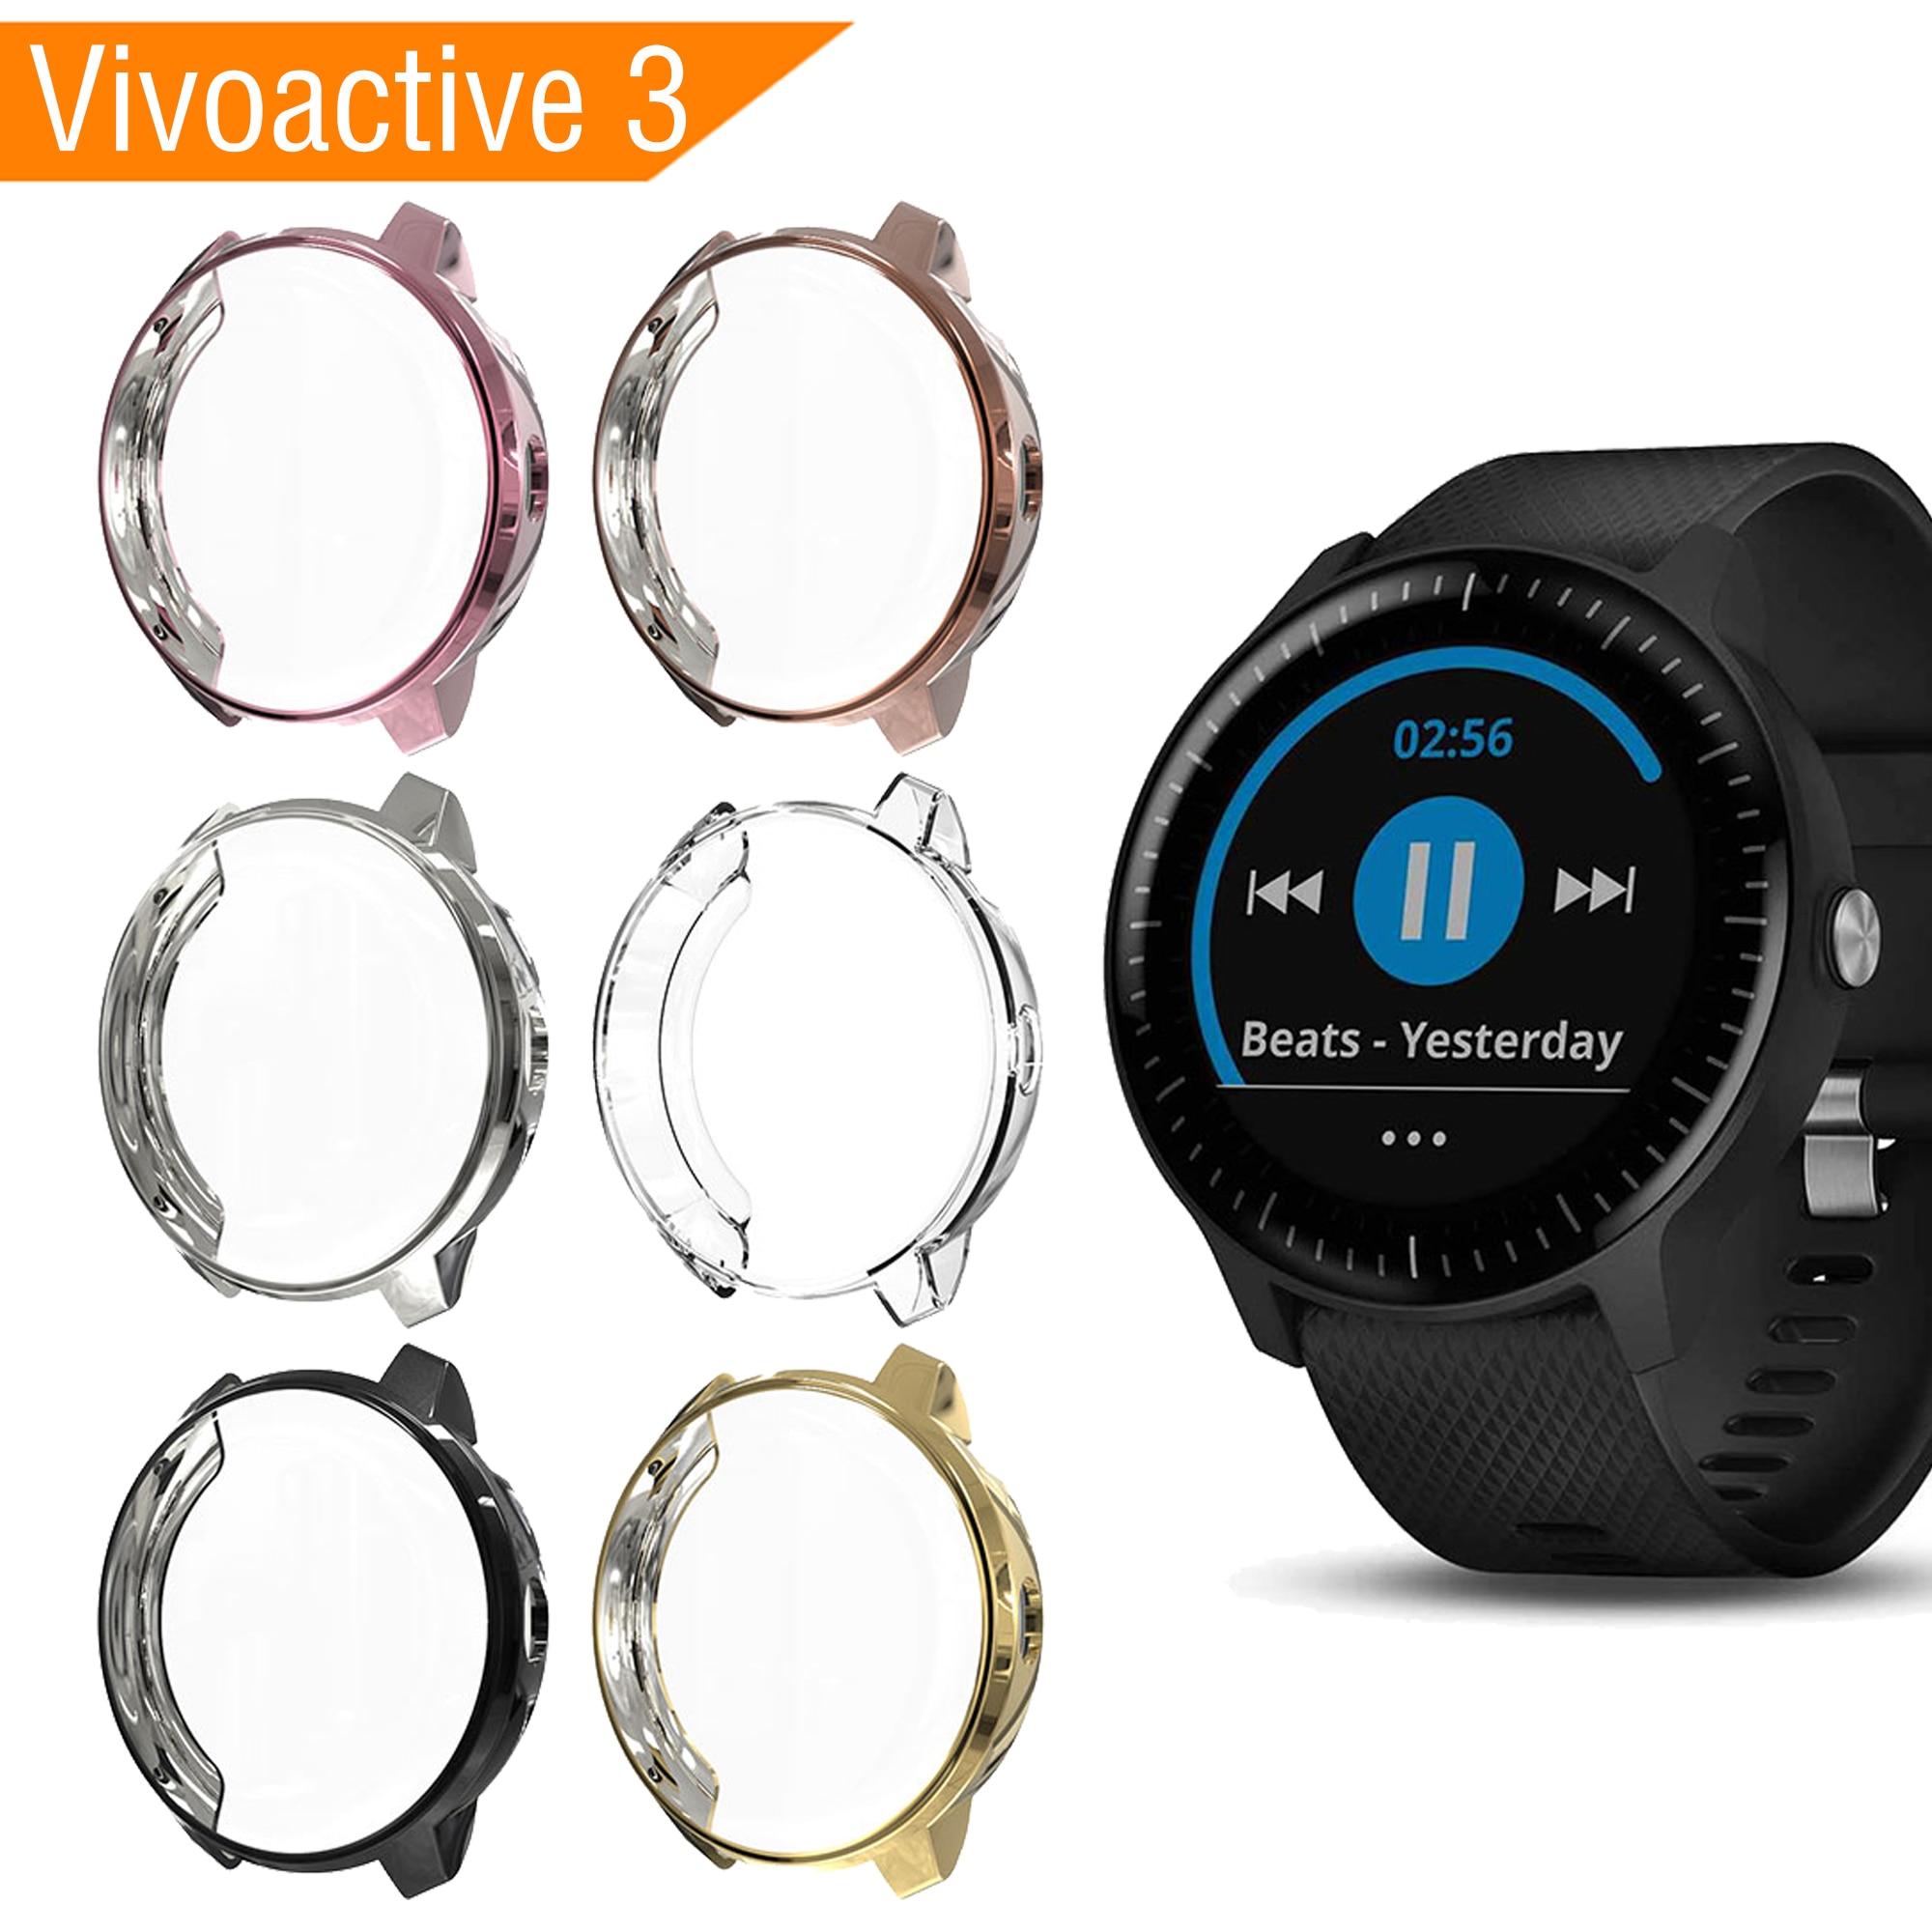 2019 Smart Watch Case For Garmin Vivoactive 3 Full Protection TPU Case For Garmin Vivoactive3 Screen Protector For Vivoactive 3